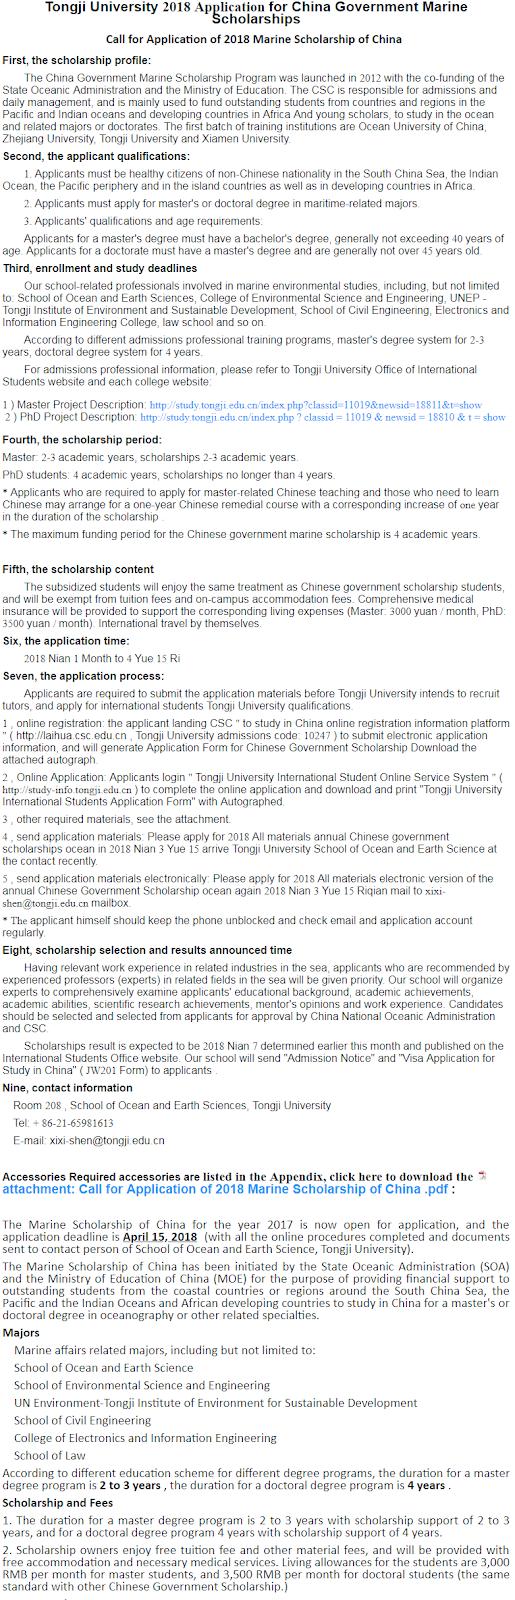 Tongji University Marine Scholarships 2018, Description of Scholarship, Eligibility Criteria, Application Deadline, Method of Applying, Introduction,